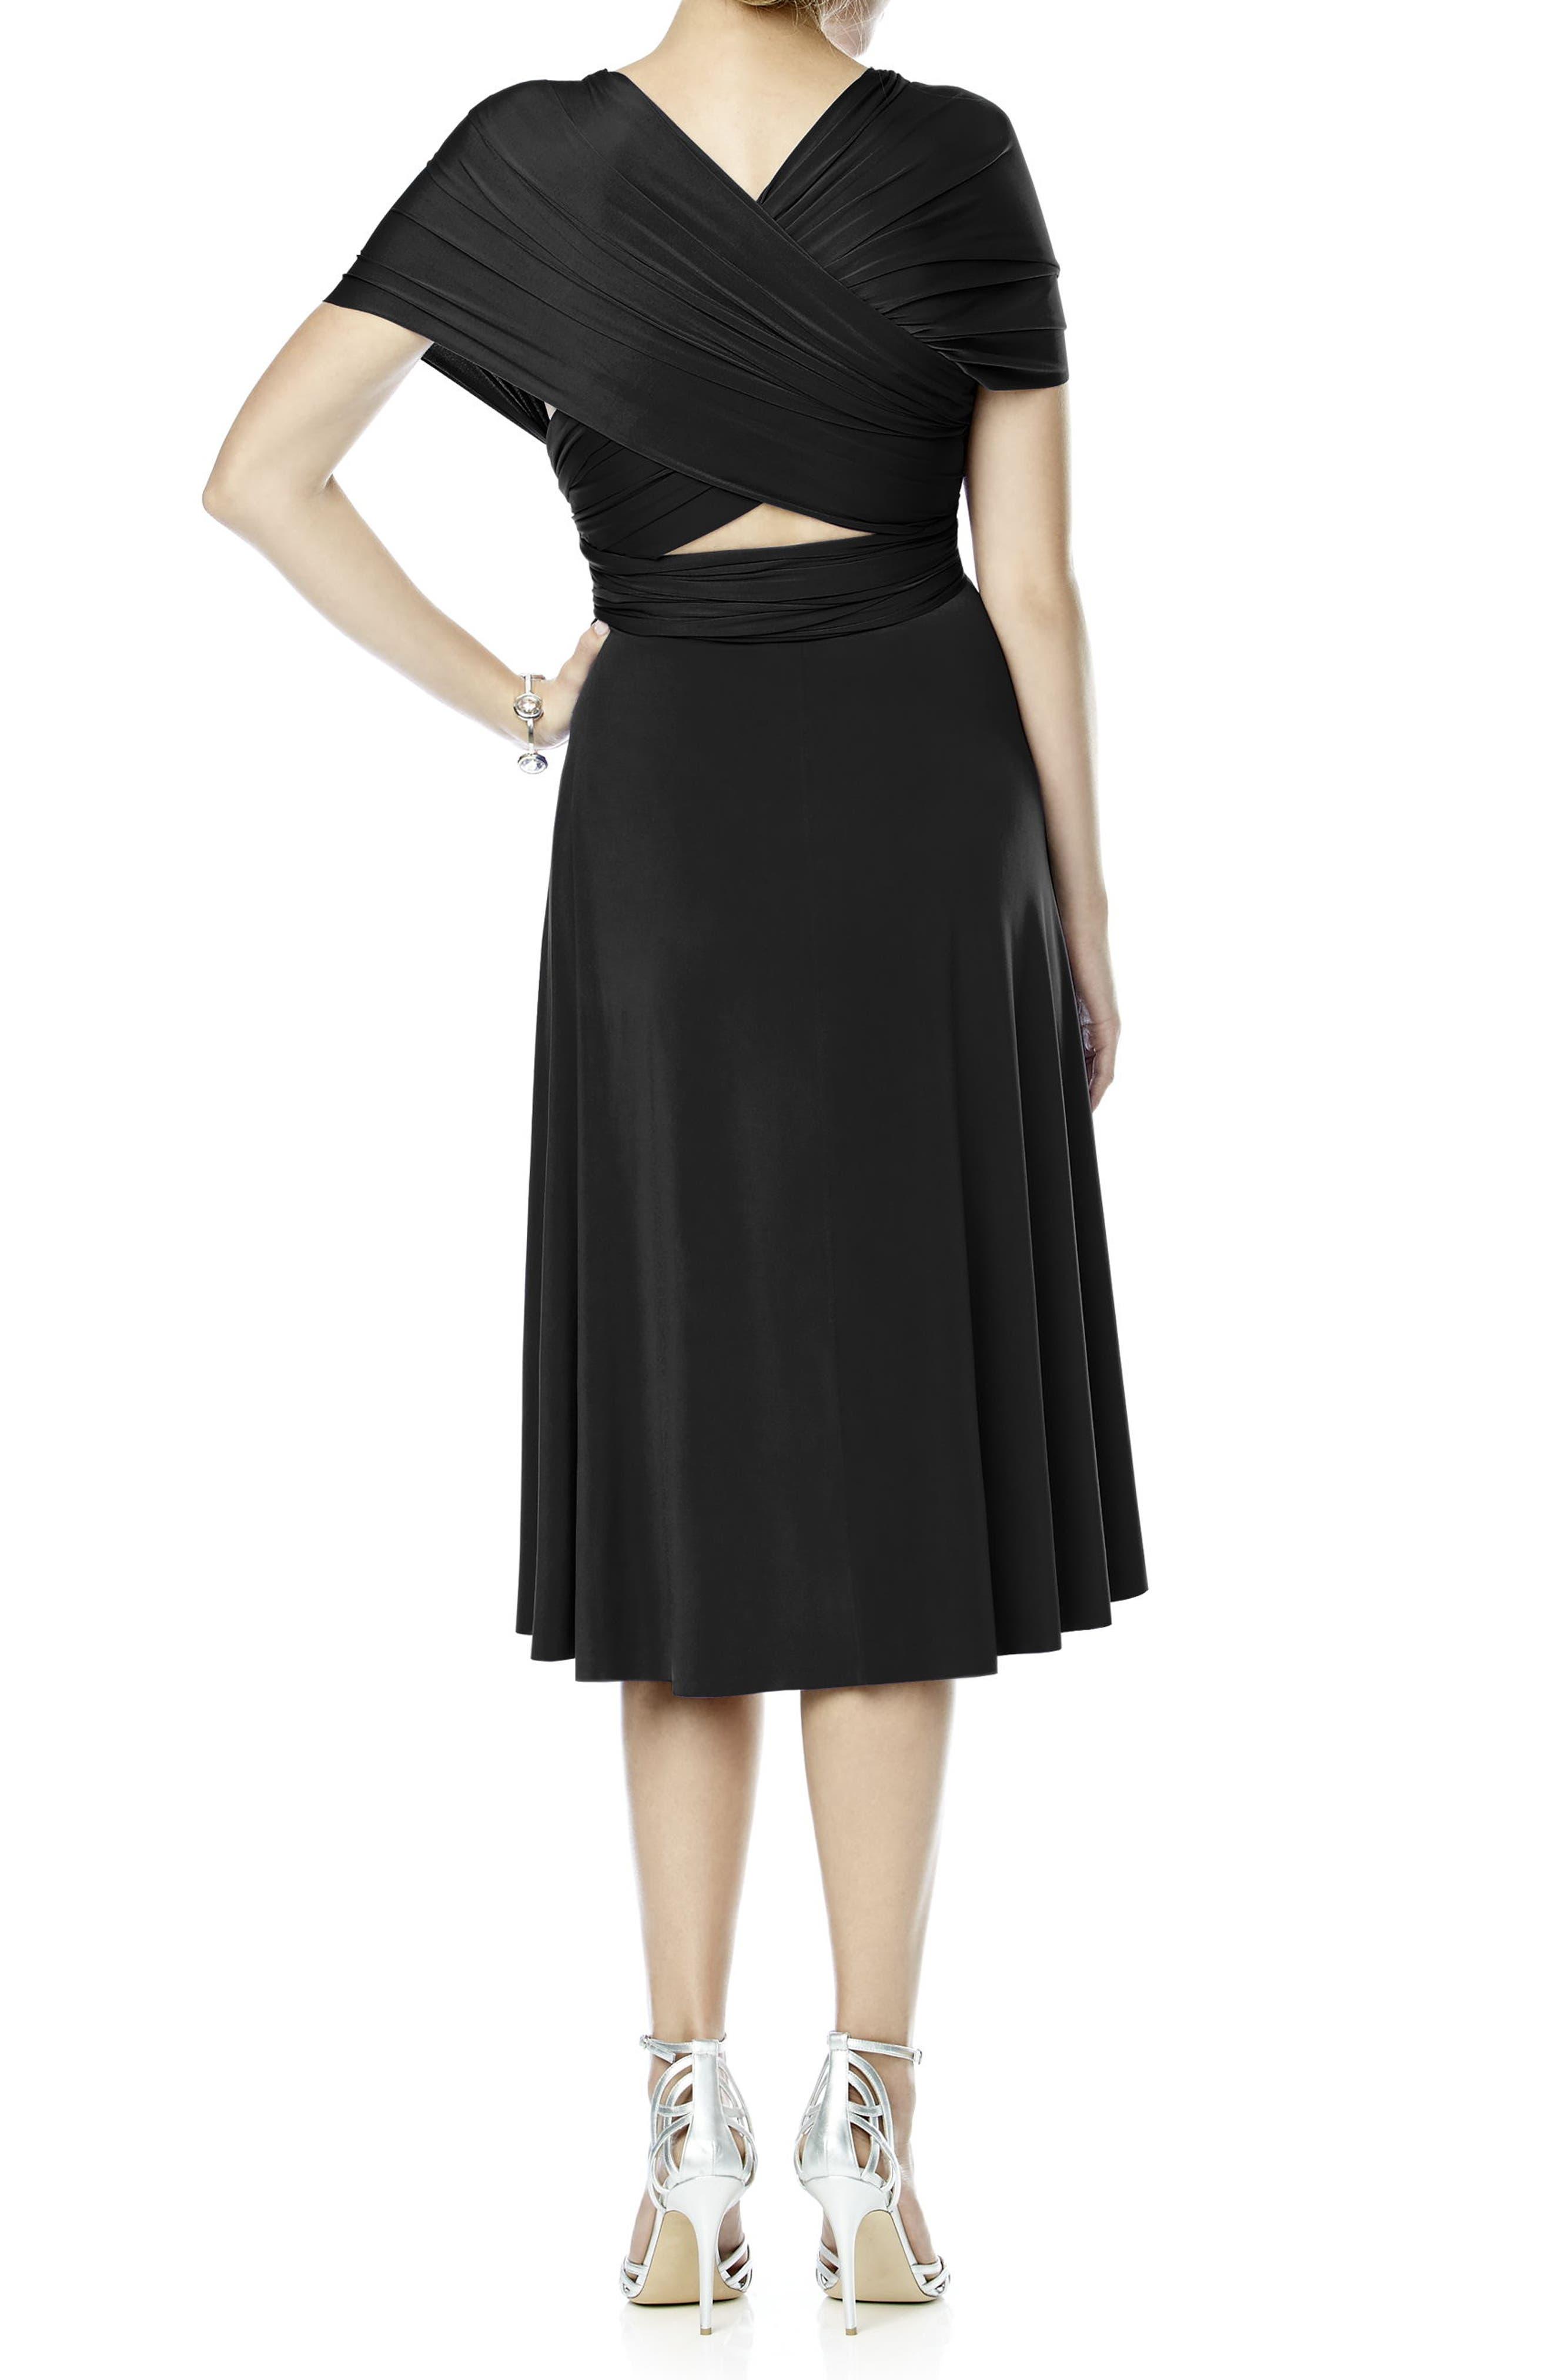 DESSY COLLECTION, Convertible Wrap Tie Surplice Jersey Dress, Alternate thumbnail 2, color, 001